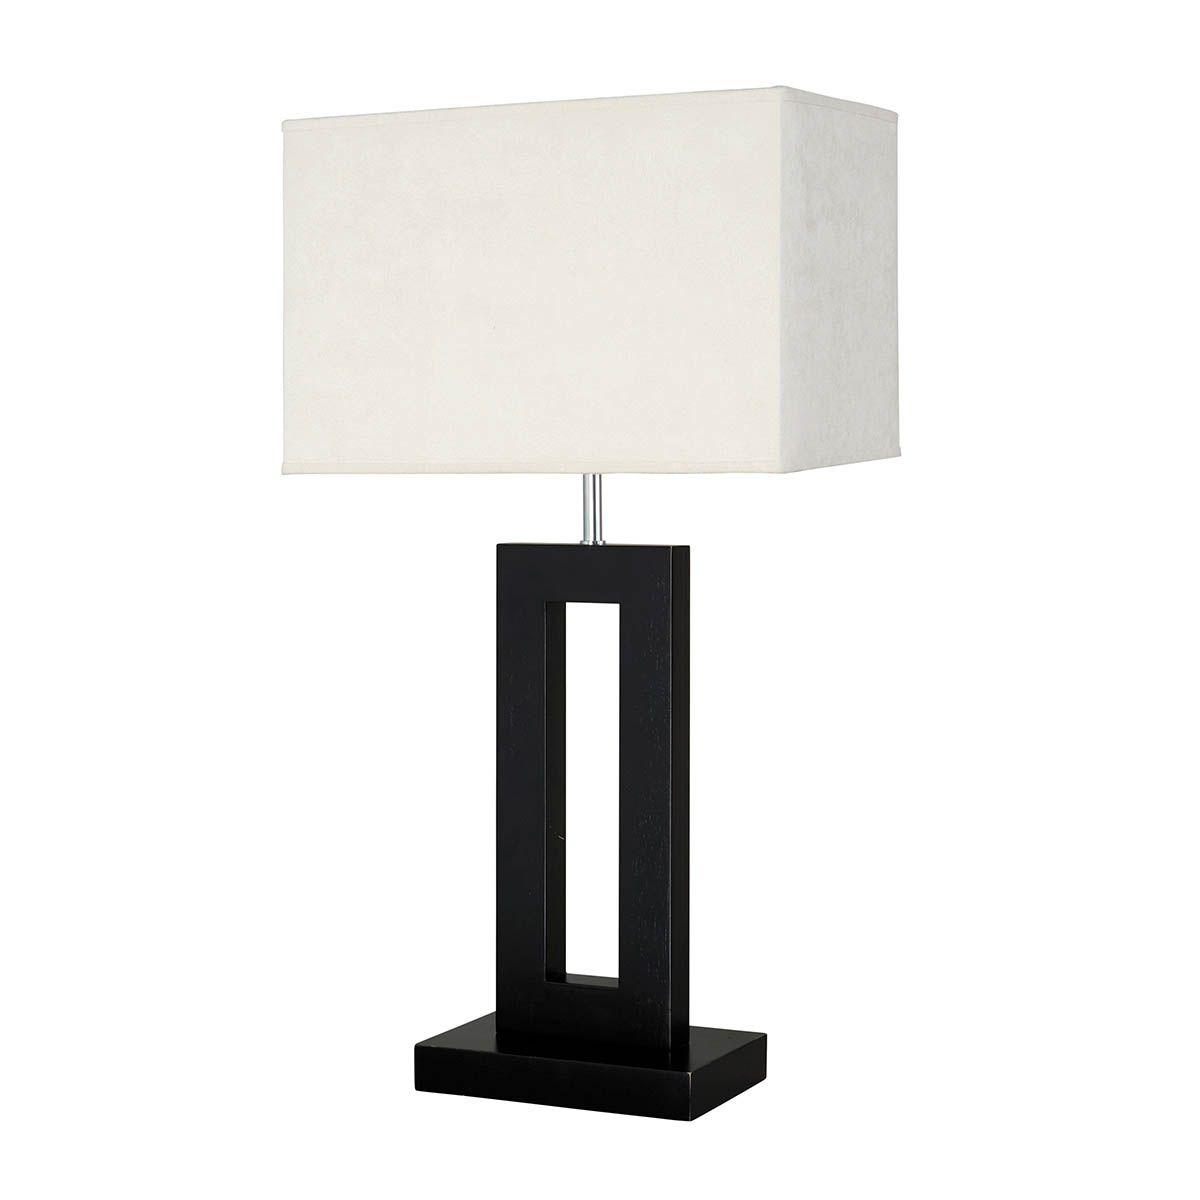 Lighting Electrical Wholesaler Supply Australia Brilliant Lighting Lamp Table Lamp Lamp Bases